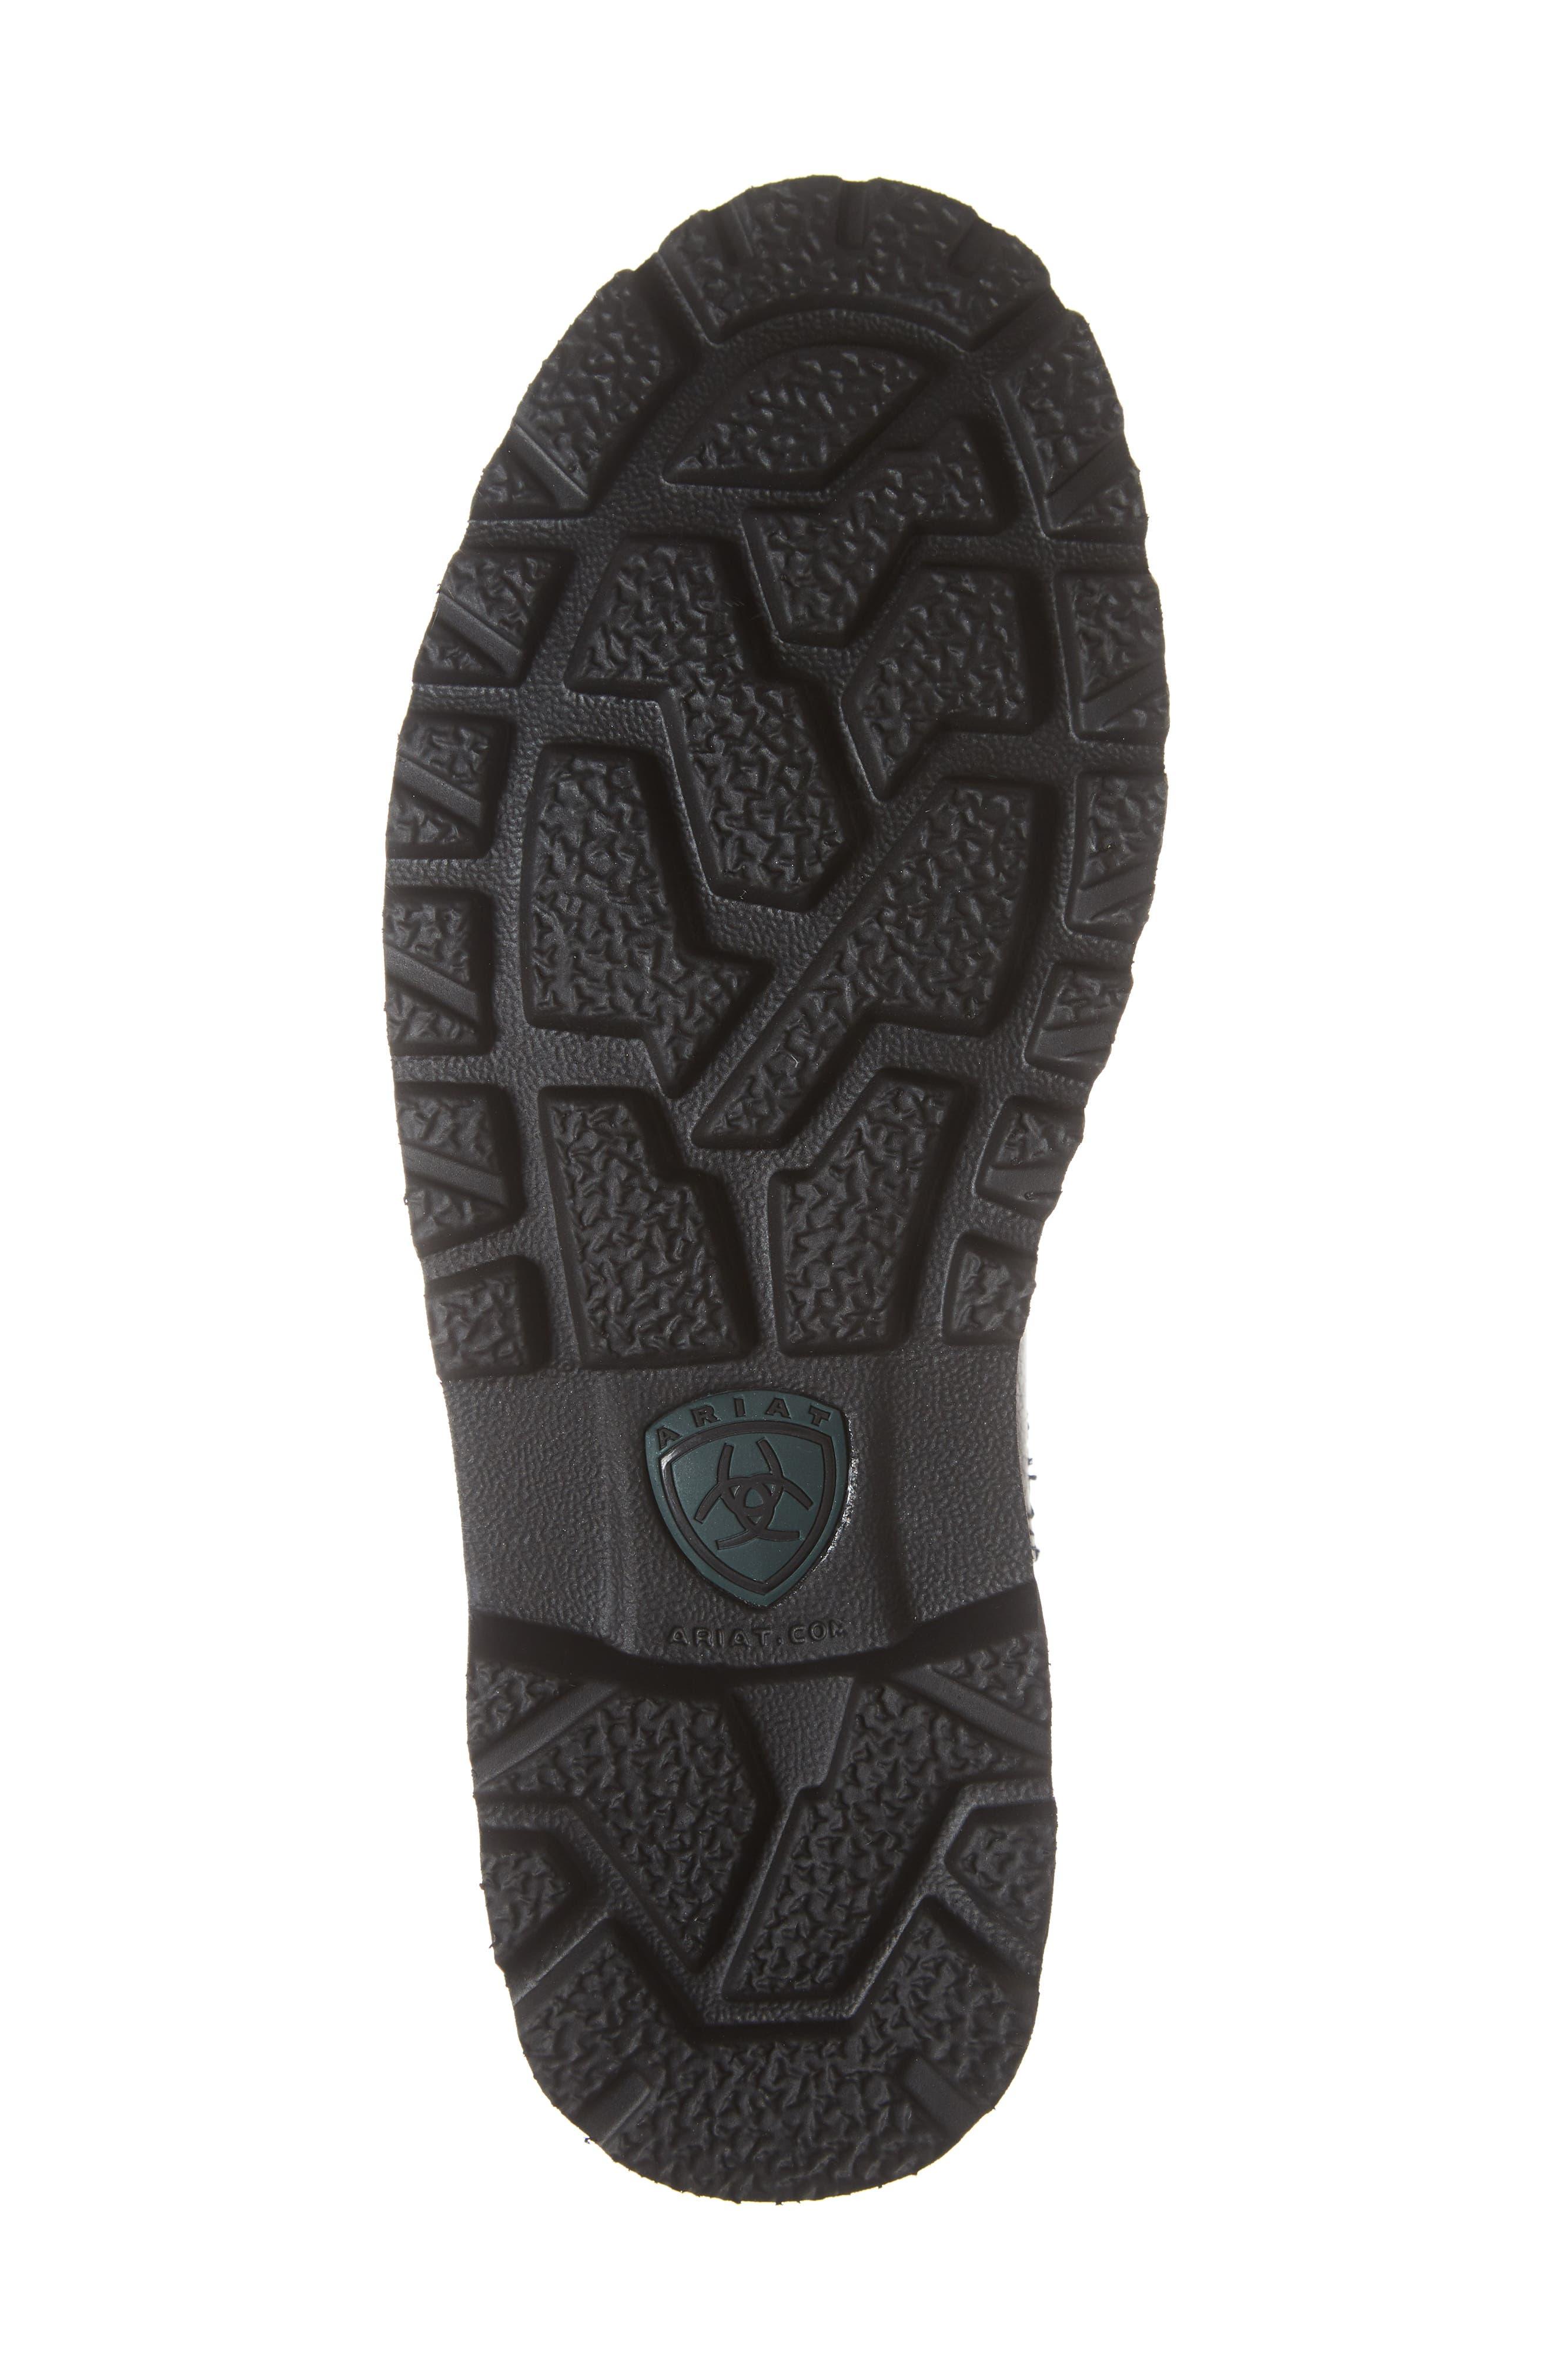 Spothog Chelsea Boot,                             Alternate thumbnail 6, color,                             BLACK DEER TAN LEATHER